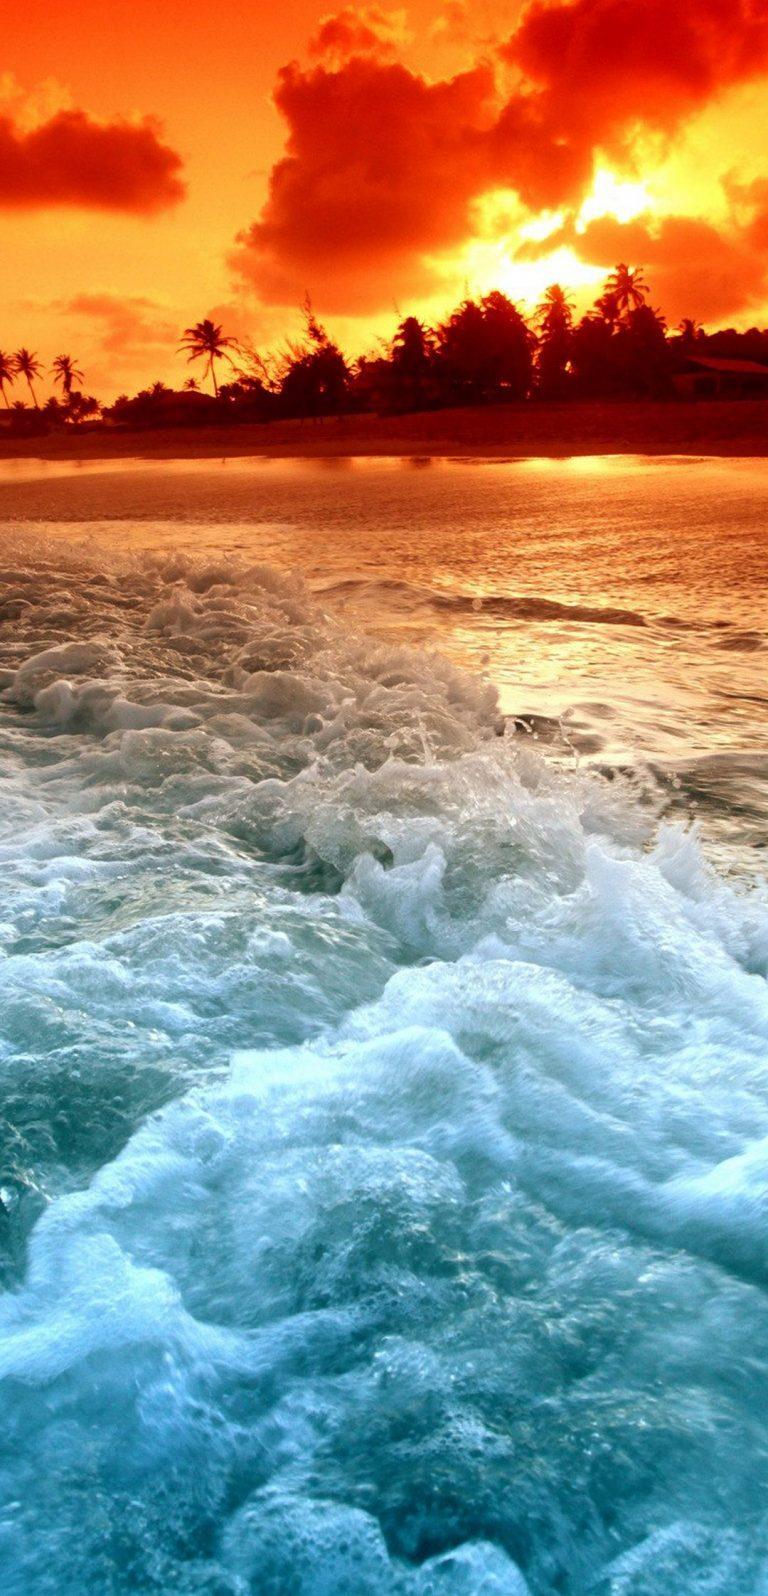 Tropical Beach Sunset 1080x2244 768x1596